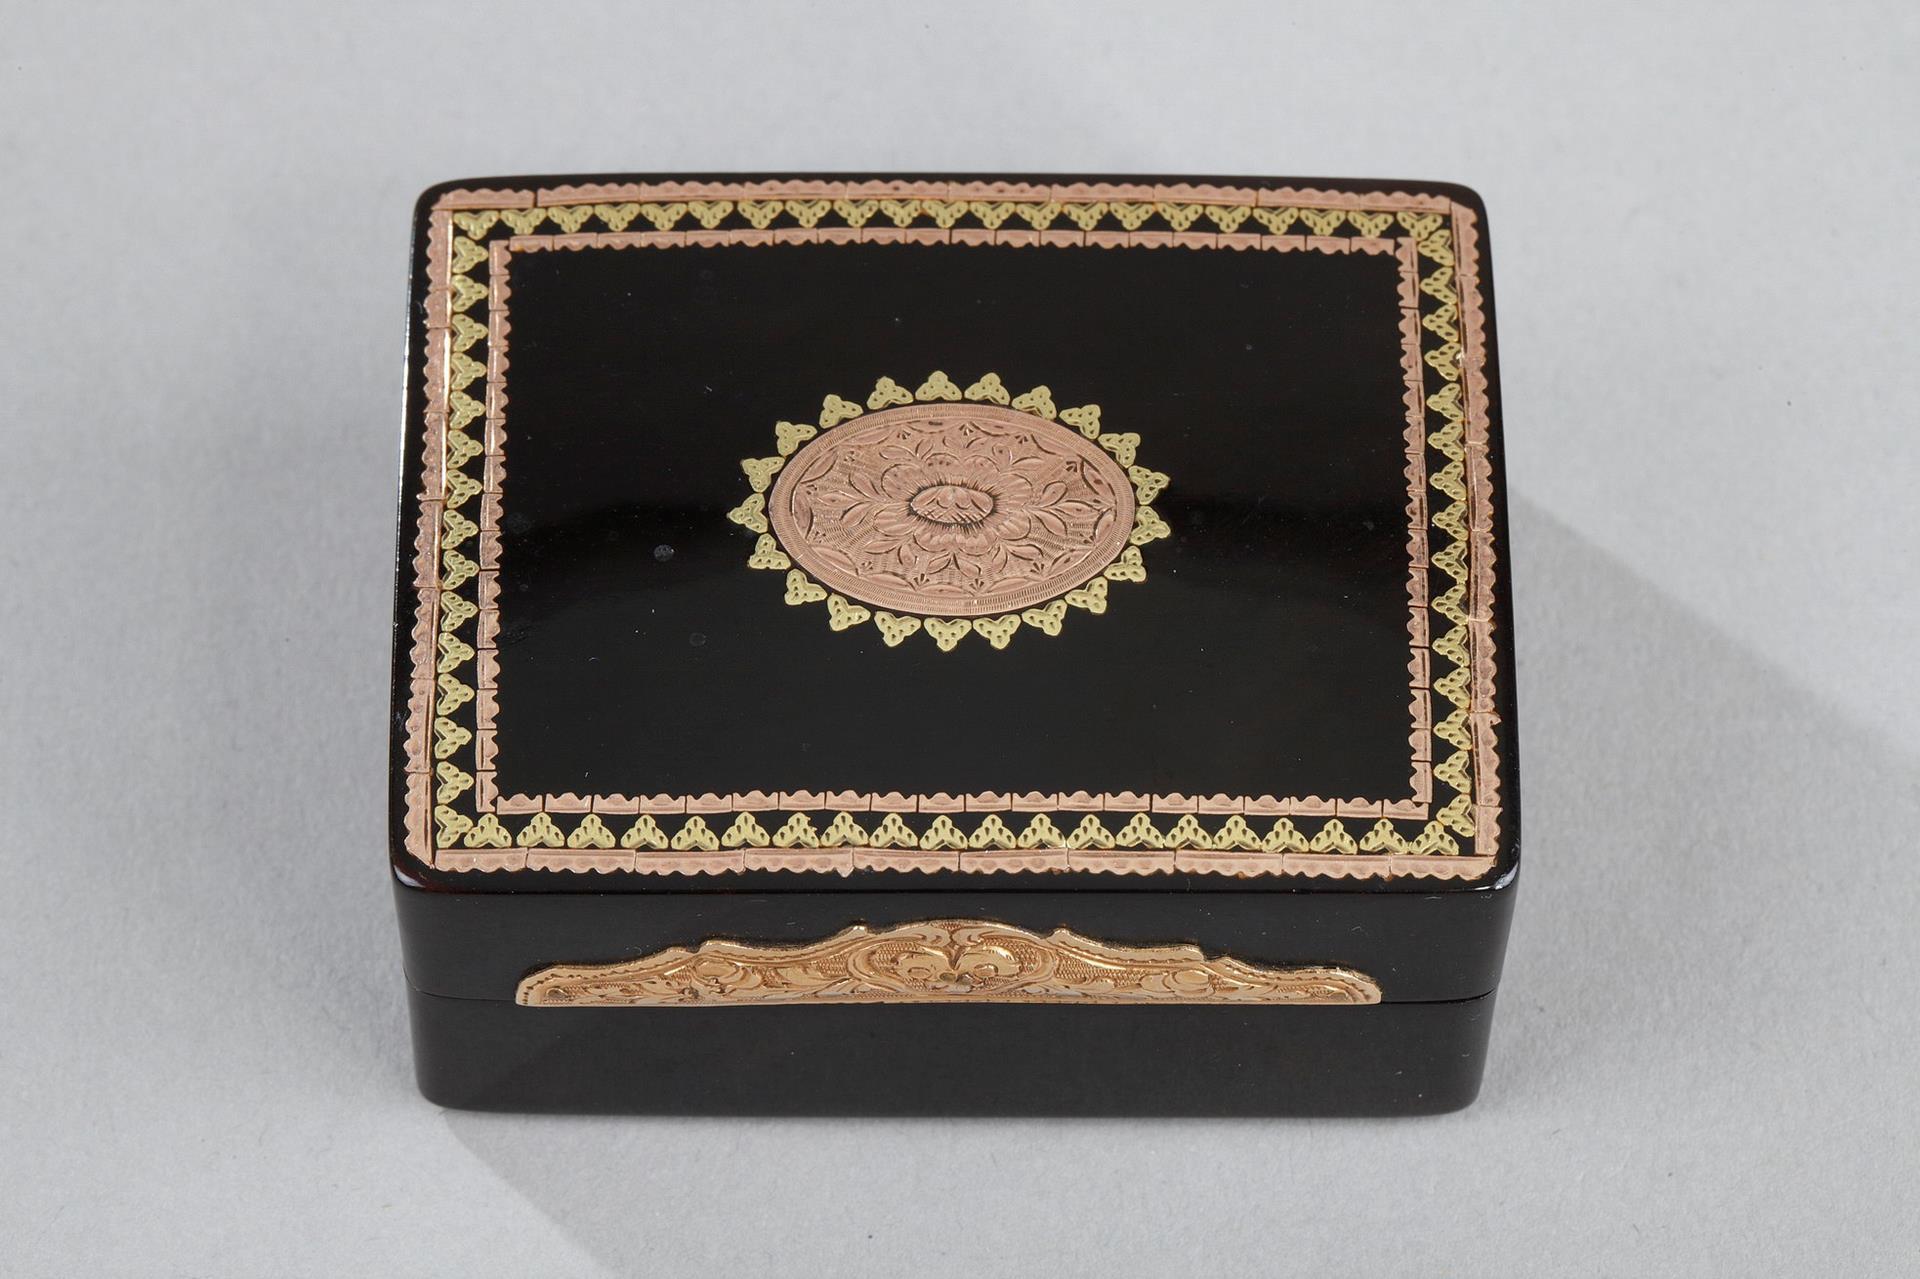 TORTOISESHELL AND GOLD TOILETRIES BOX.<br/> Louis XVI PERIOD.